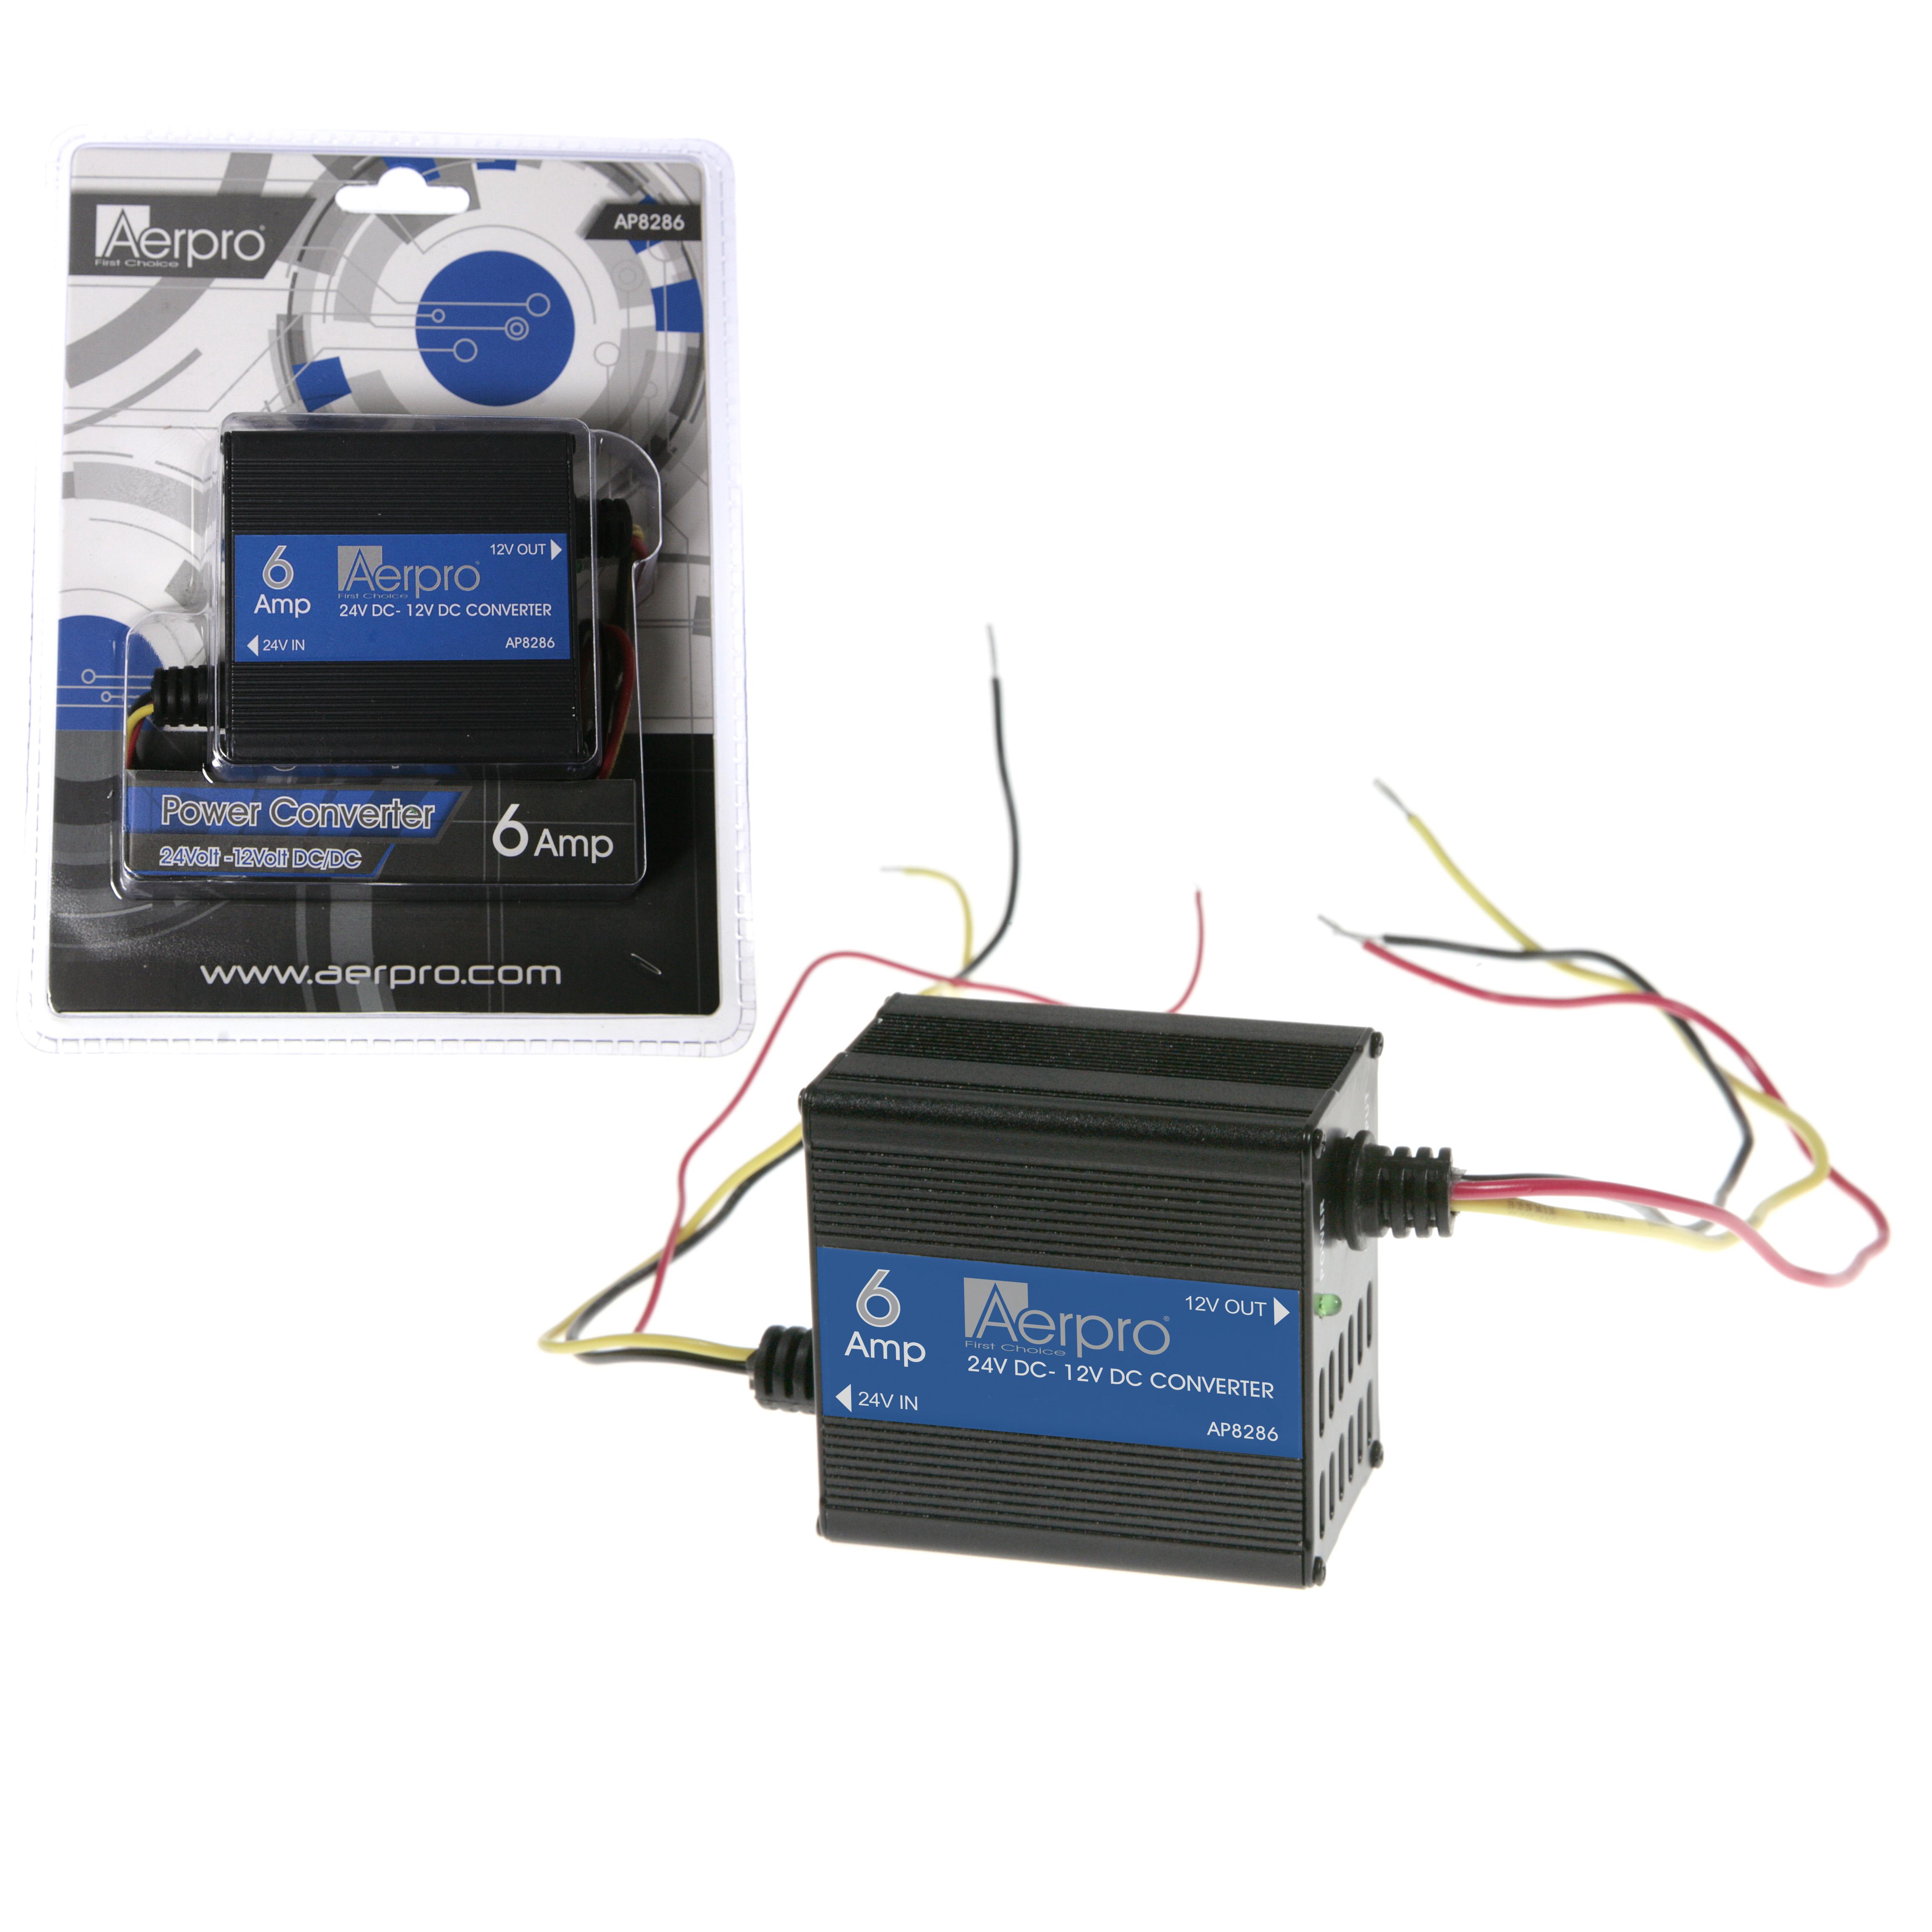 Aerpro First Choice 6 To 12 Volt Converter Ap8286 24v 12v Reducer 6a